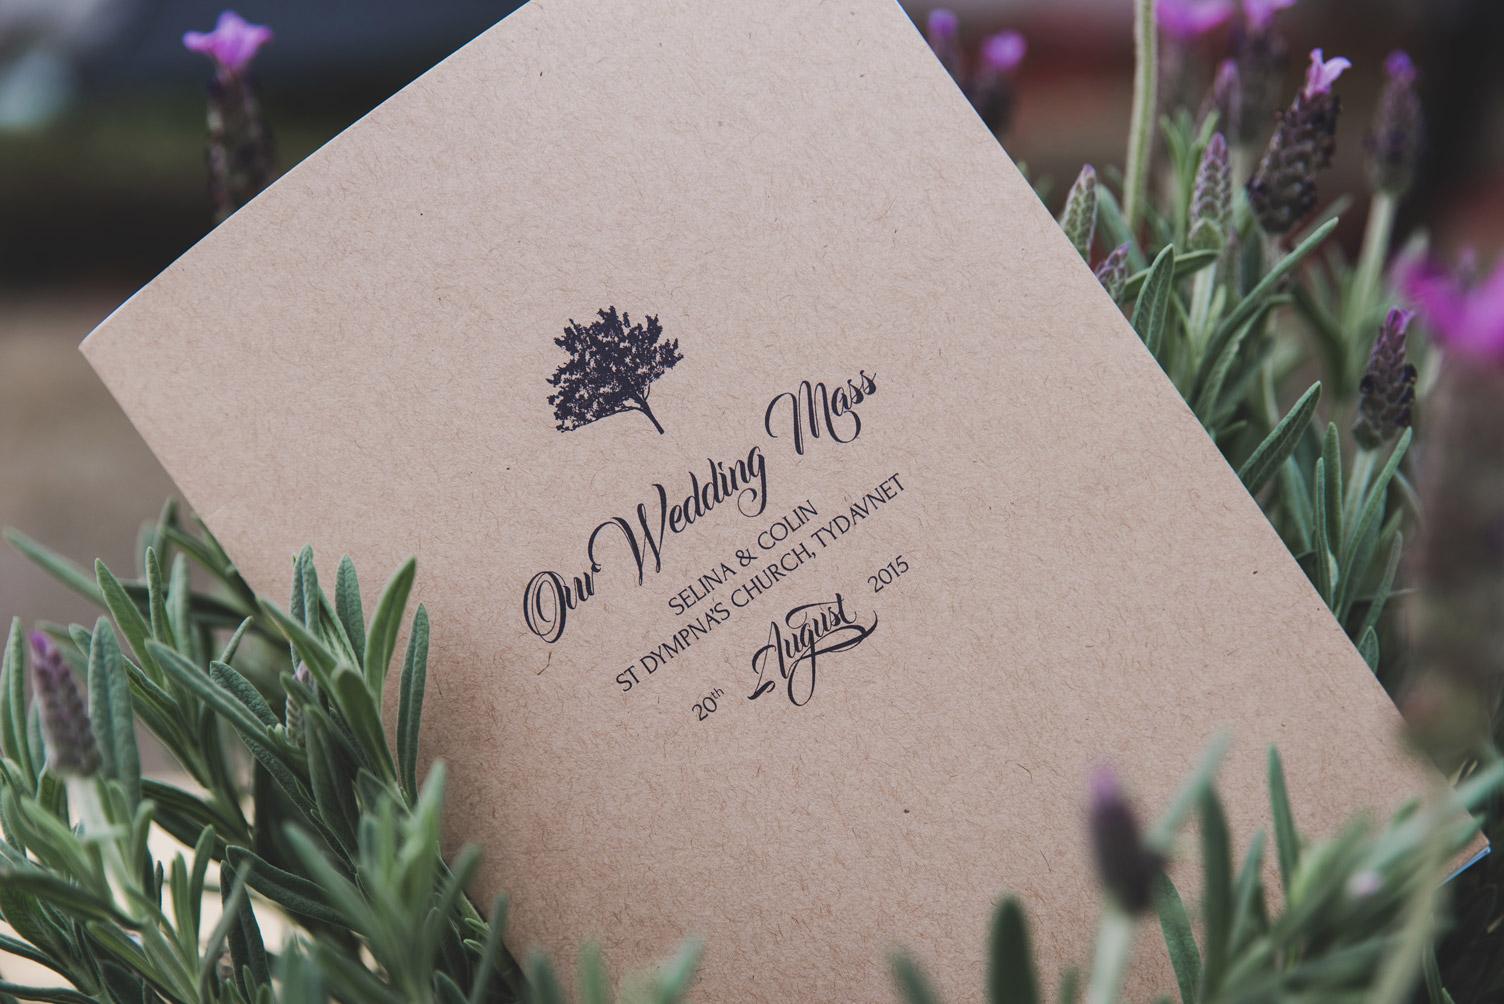 Wedding morning flowers and Church booklett